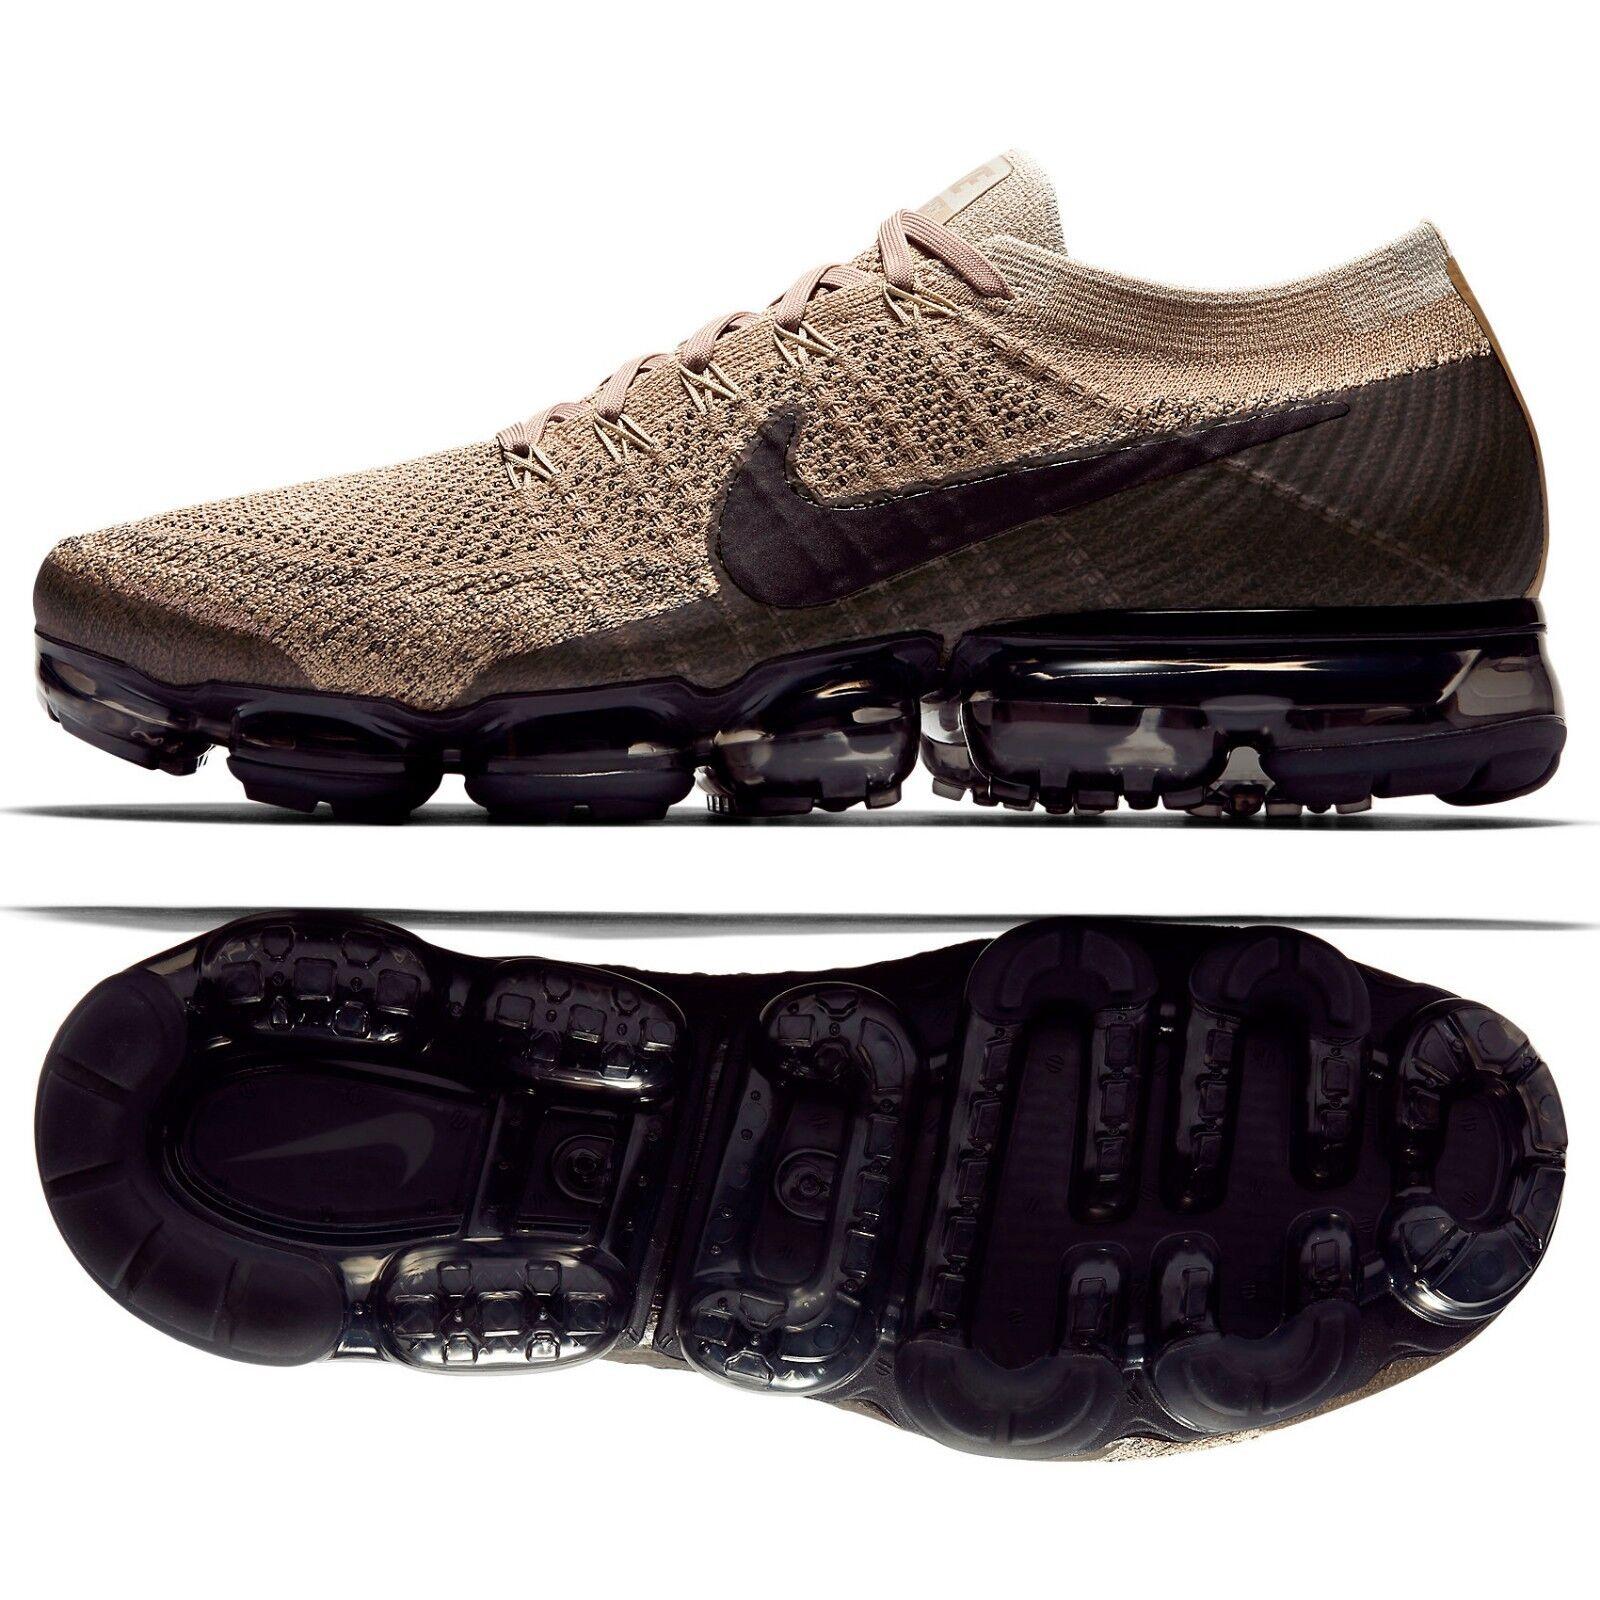 Nike Air VaporMax Flyknit Pudding 849558-201 Khaki Anthracite Men Running shoes